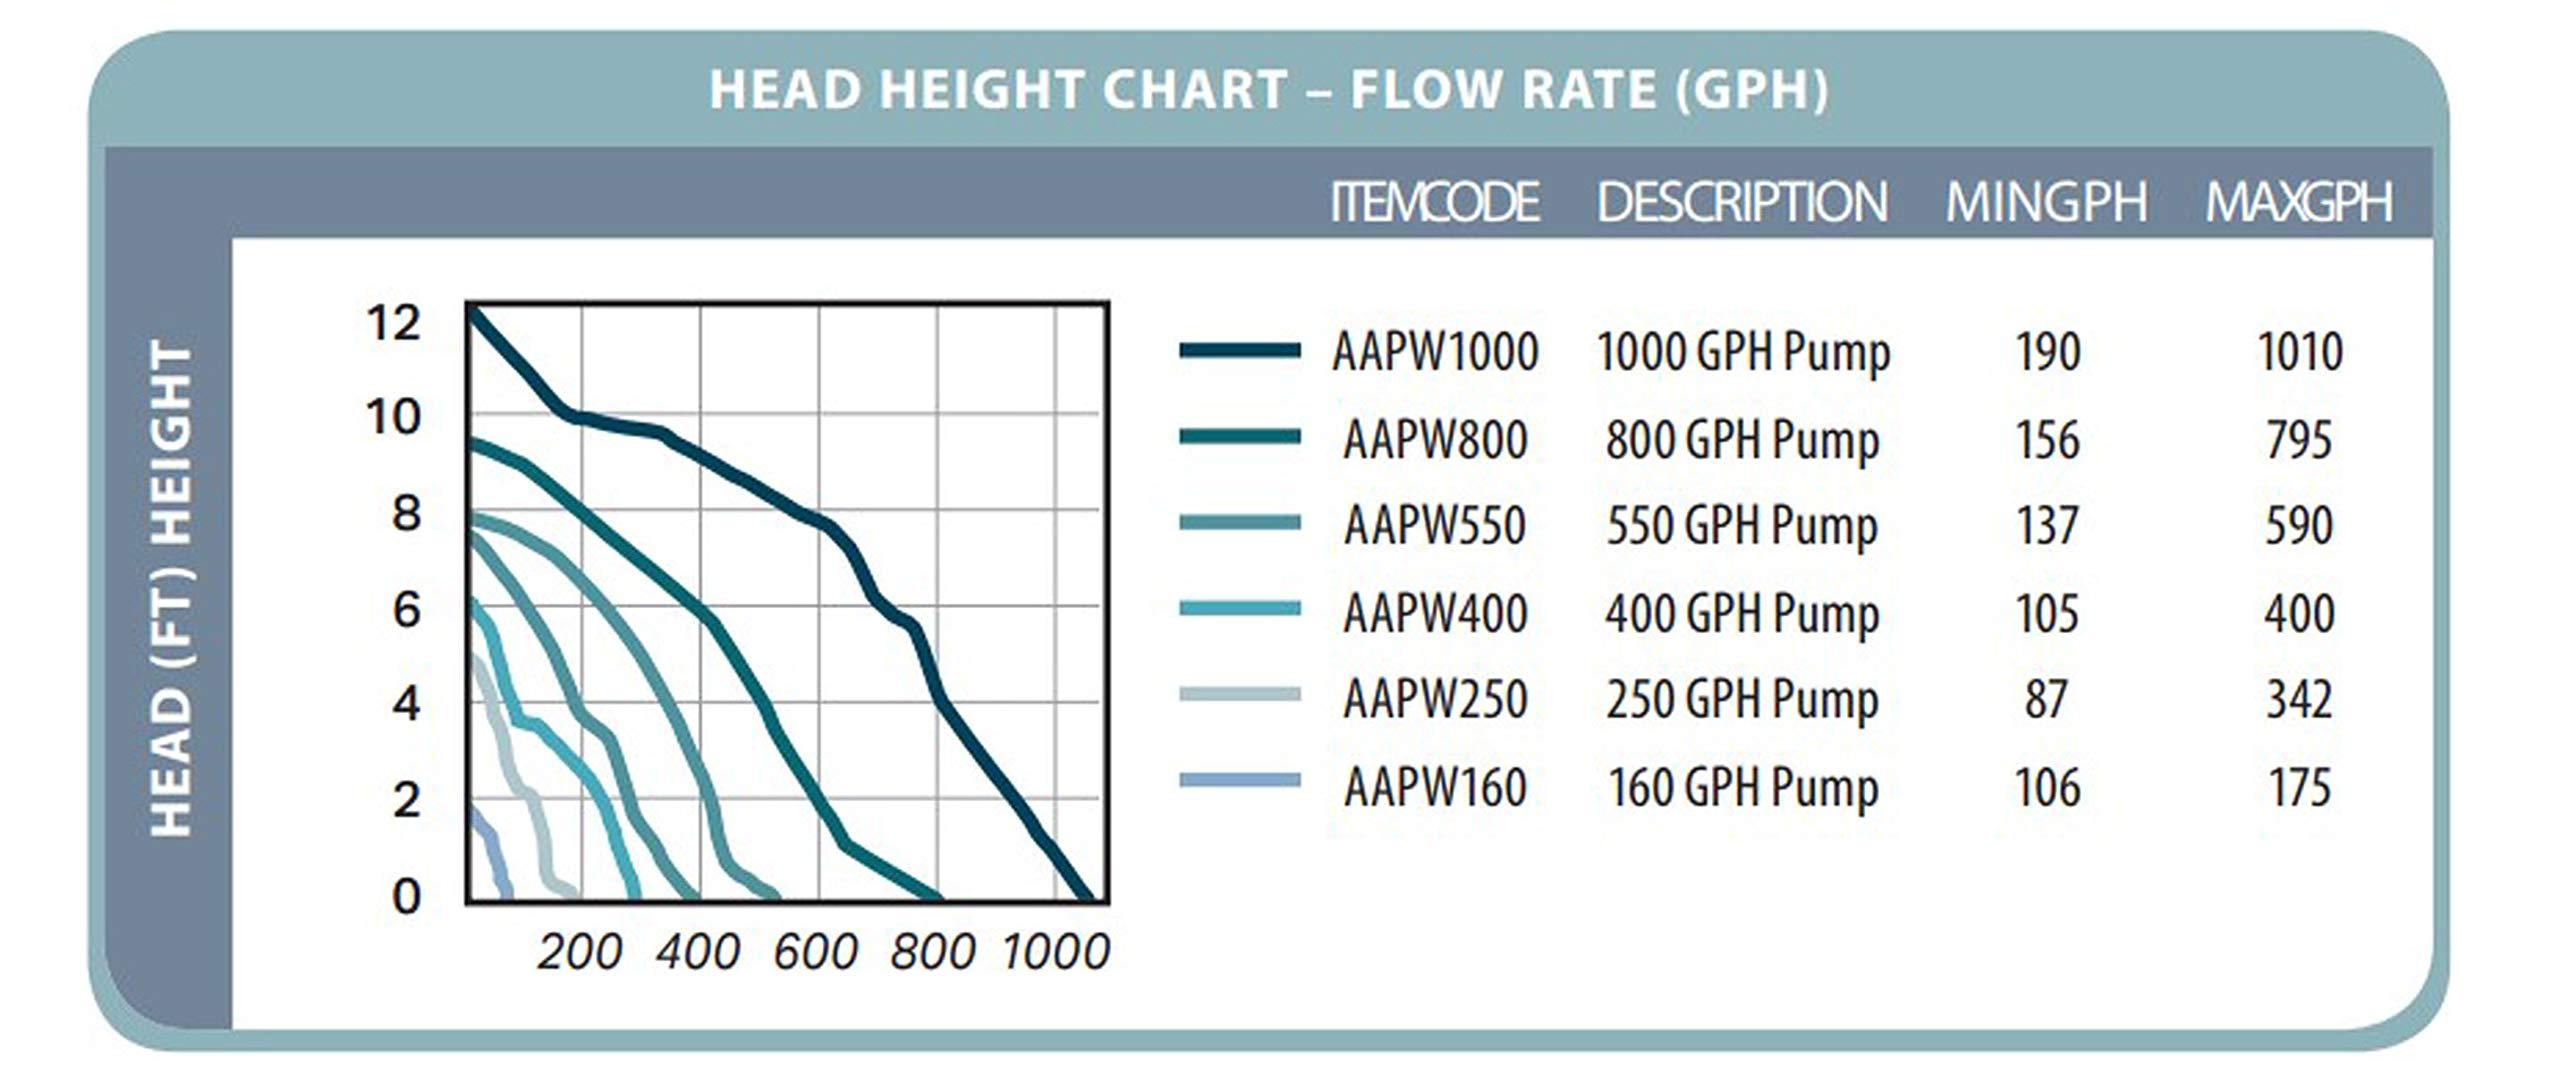 Hydrofarm AAPW1000 92-Watt 1000 GPH Indoor/Outdoor Hydroponic Aquarium Pond 6ft Power Cord for 55 Gallon Reservoirs Submersible Water Pump, 1000-GPH, Black